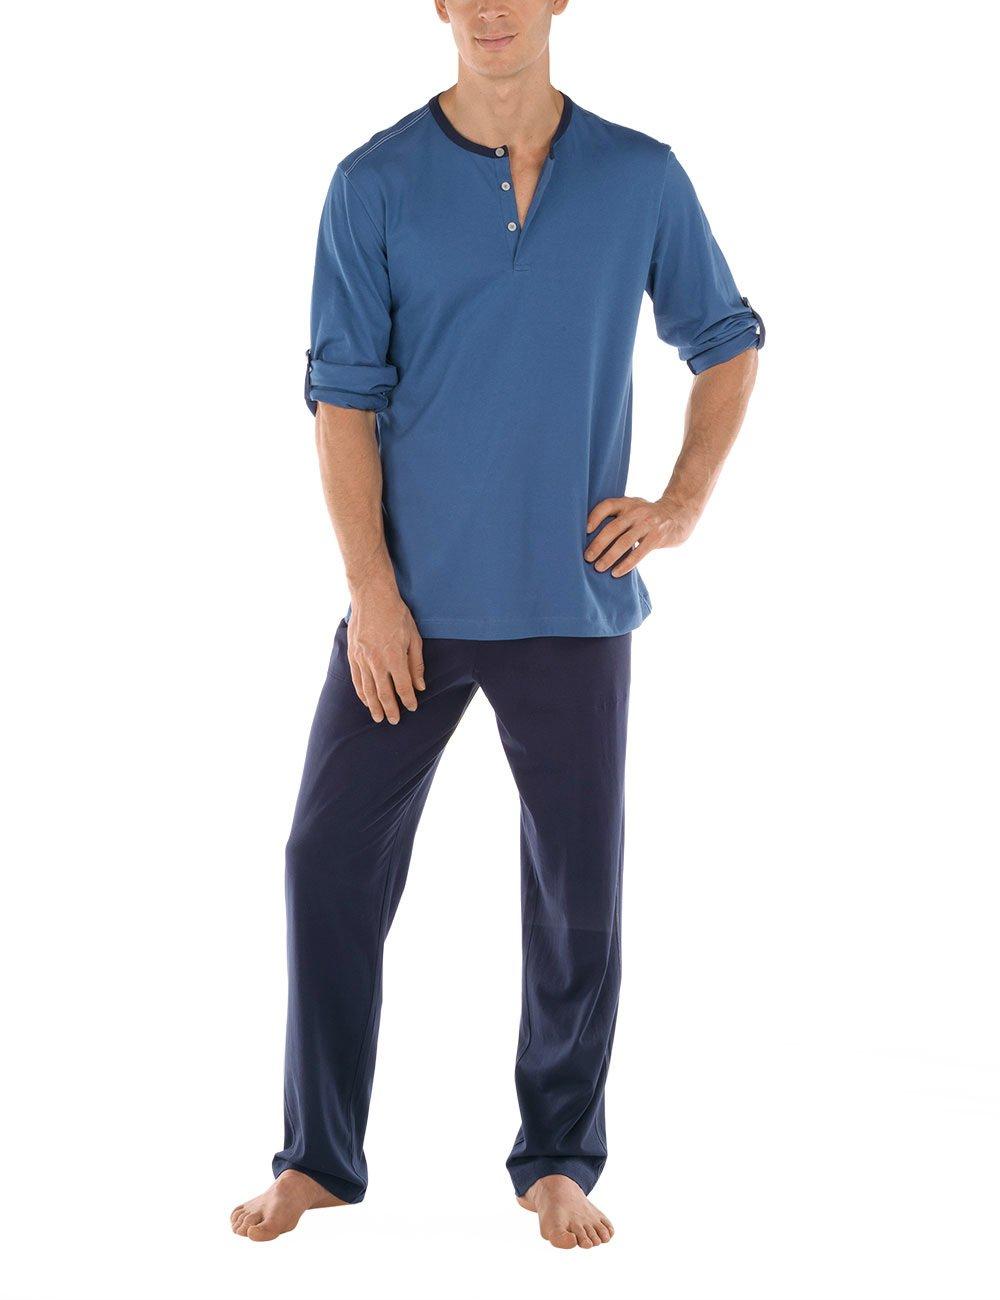 Calida mens cotton knit pajamas set Dakar 49168 (397, large)